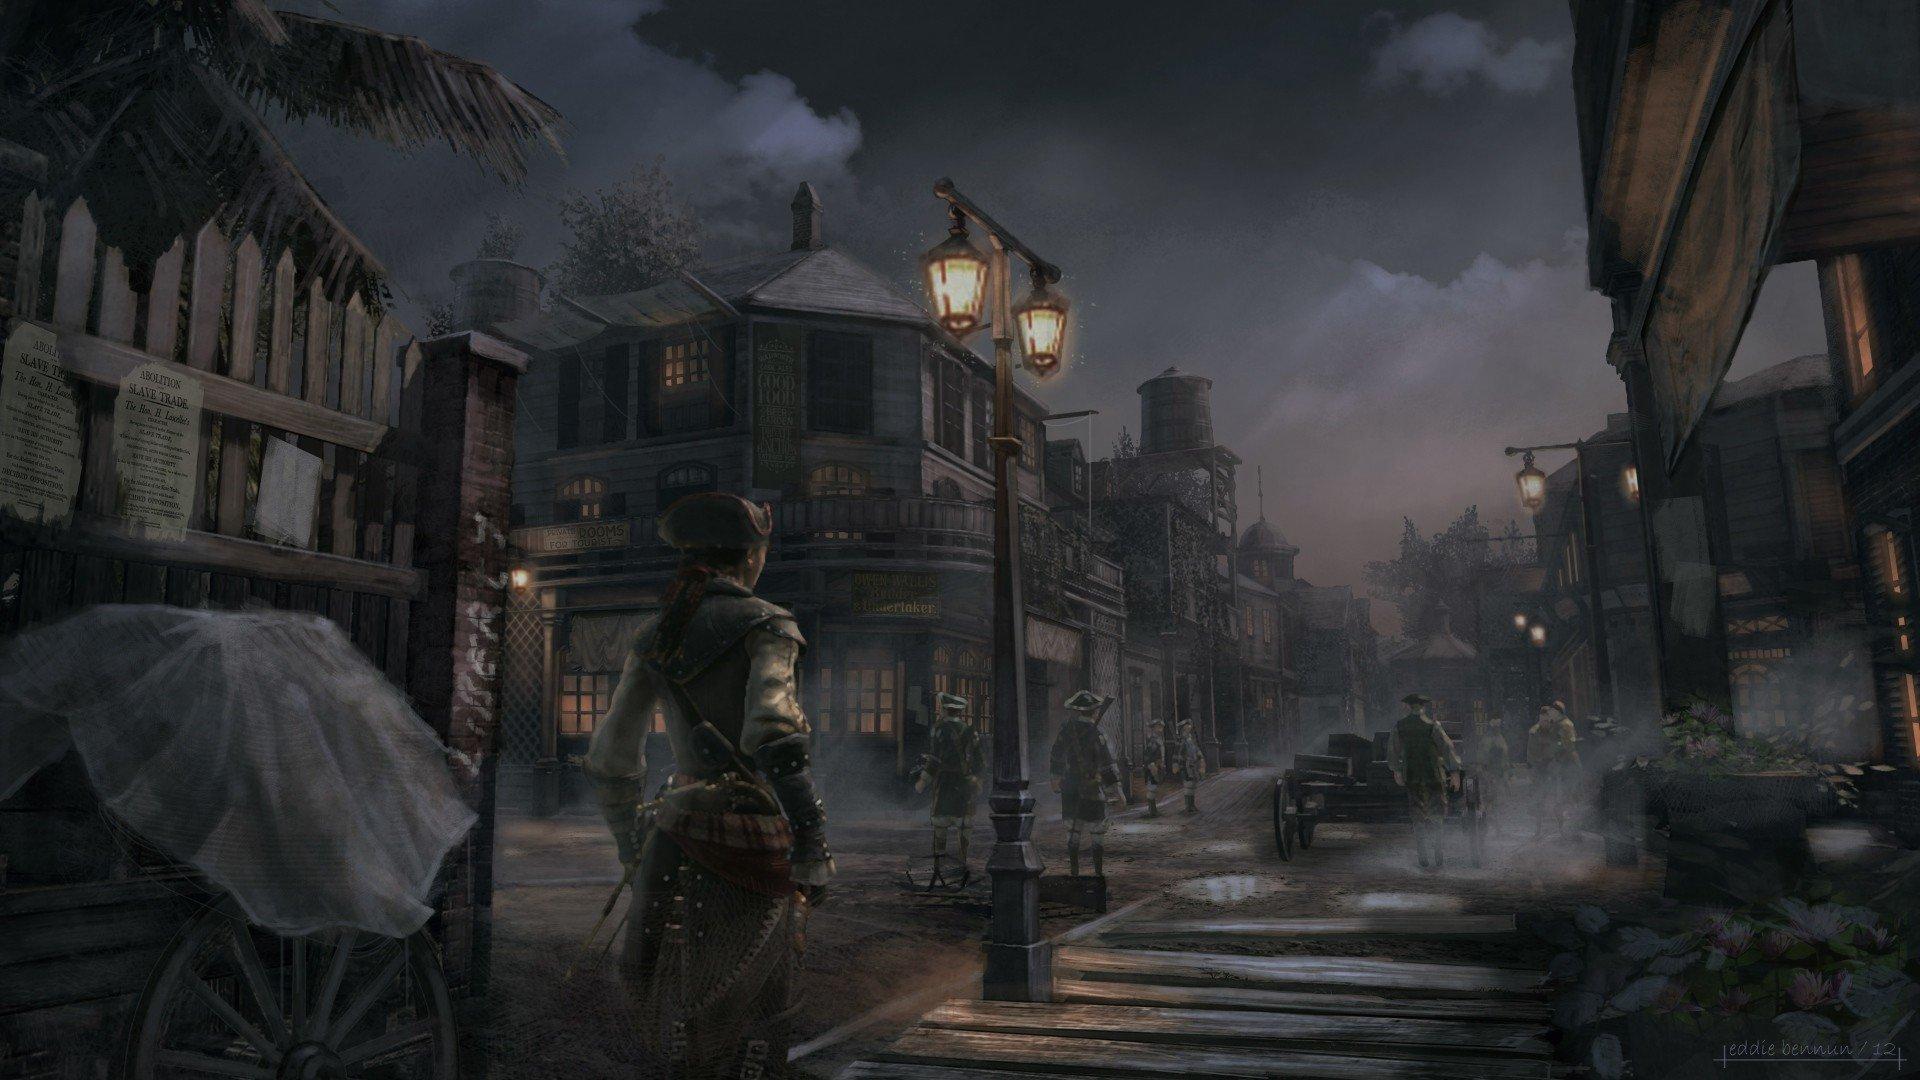 Wallpaper 1920x1080 Px Assassins Creed Assassins Creed